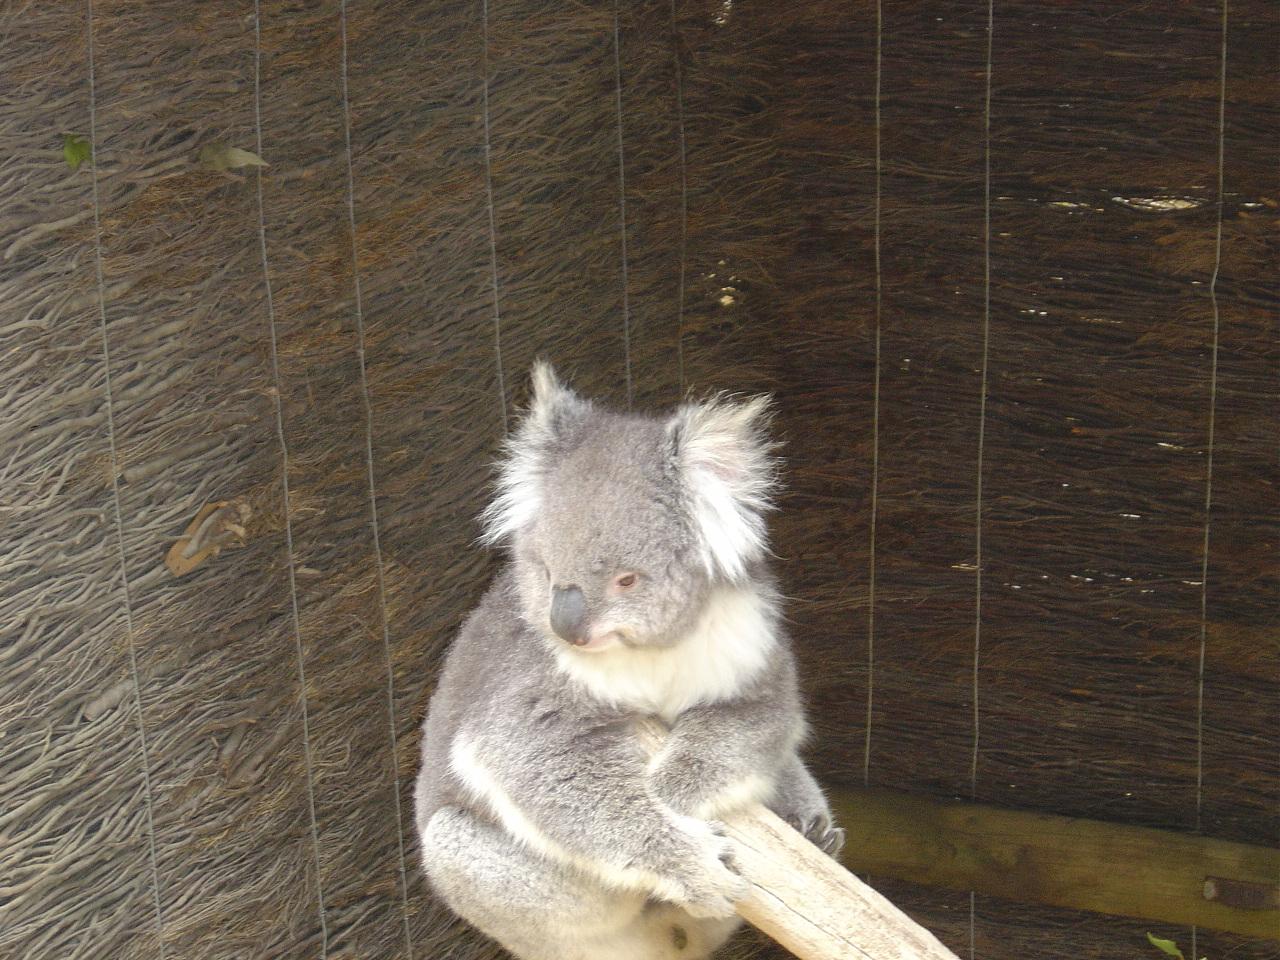 images ballarat wildlife - photo #5